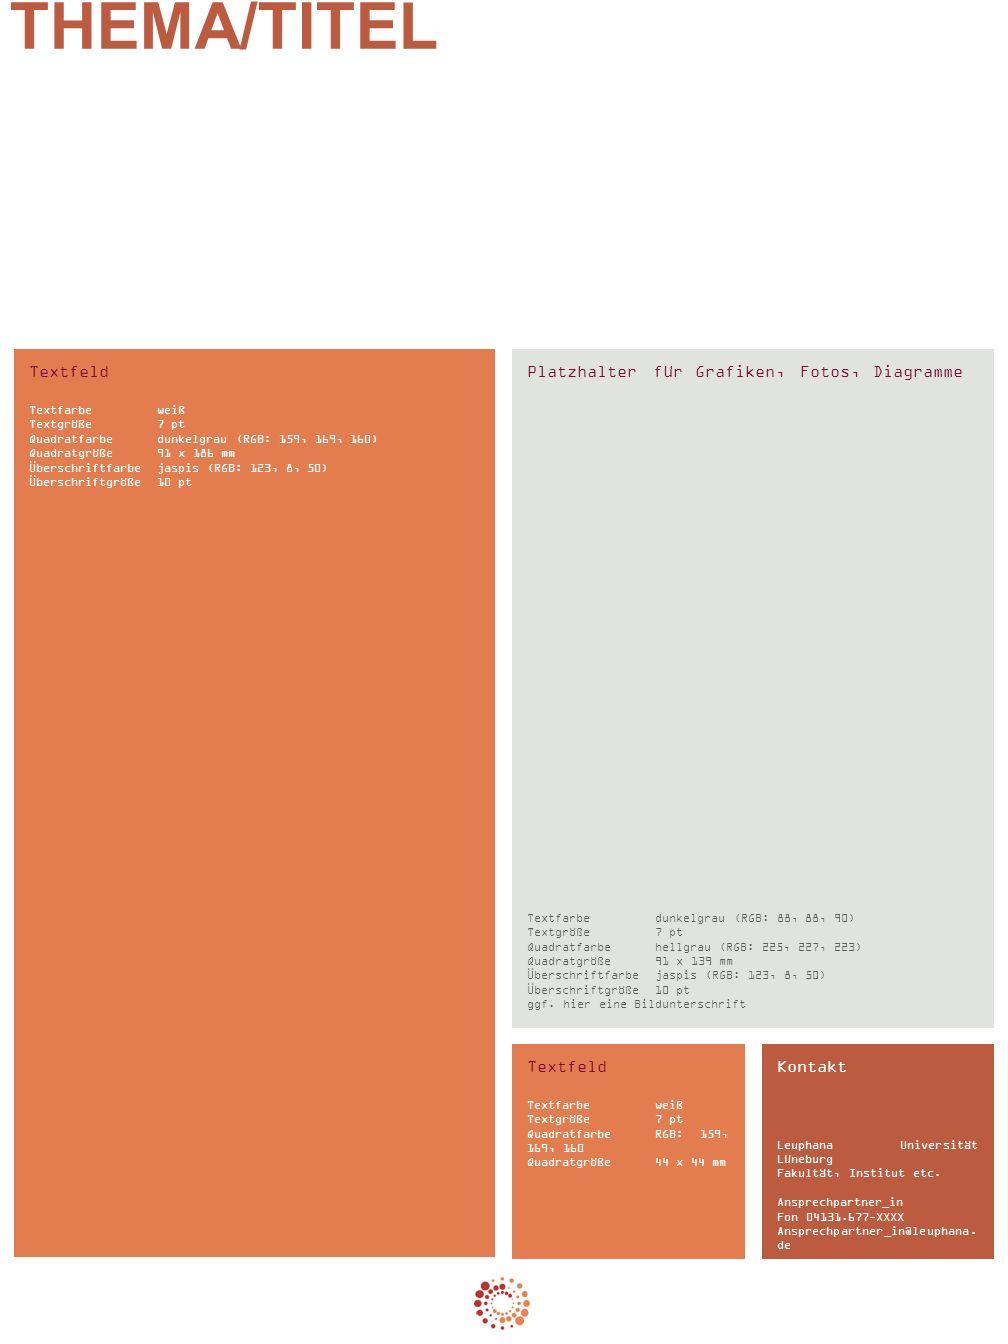 Textfeld Textfarbeweiß Textgröße 7 pt Quadratfarbedunkelgrau (RGB: 159, 169, 160) Quadratgröße91 x 186 mm Überschriftfarbejaspis (RGB: 123, 8, 50) Überschriftgröße10 pt Platzhalter für Grafiken, Fotos, Diagramme Textfarbedunkelgrau (RGB: 88, 88, 90) Textgröße 7 pt Quadratfarbehellgrau (RGB: 225, 227, 223) Quadratgröße91 x 139 mm Überschriftfarbejaspis (RGB: 123, 8, 50) Überschriftgröße10 pt ggf.